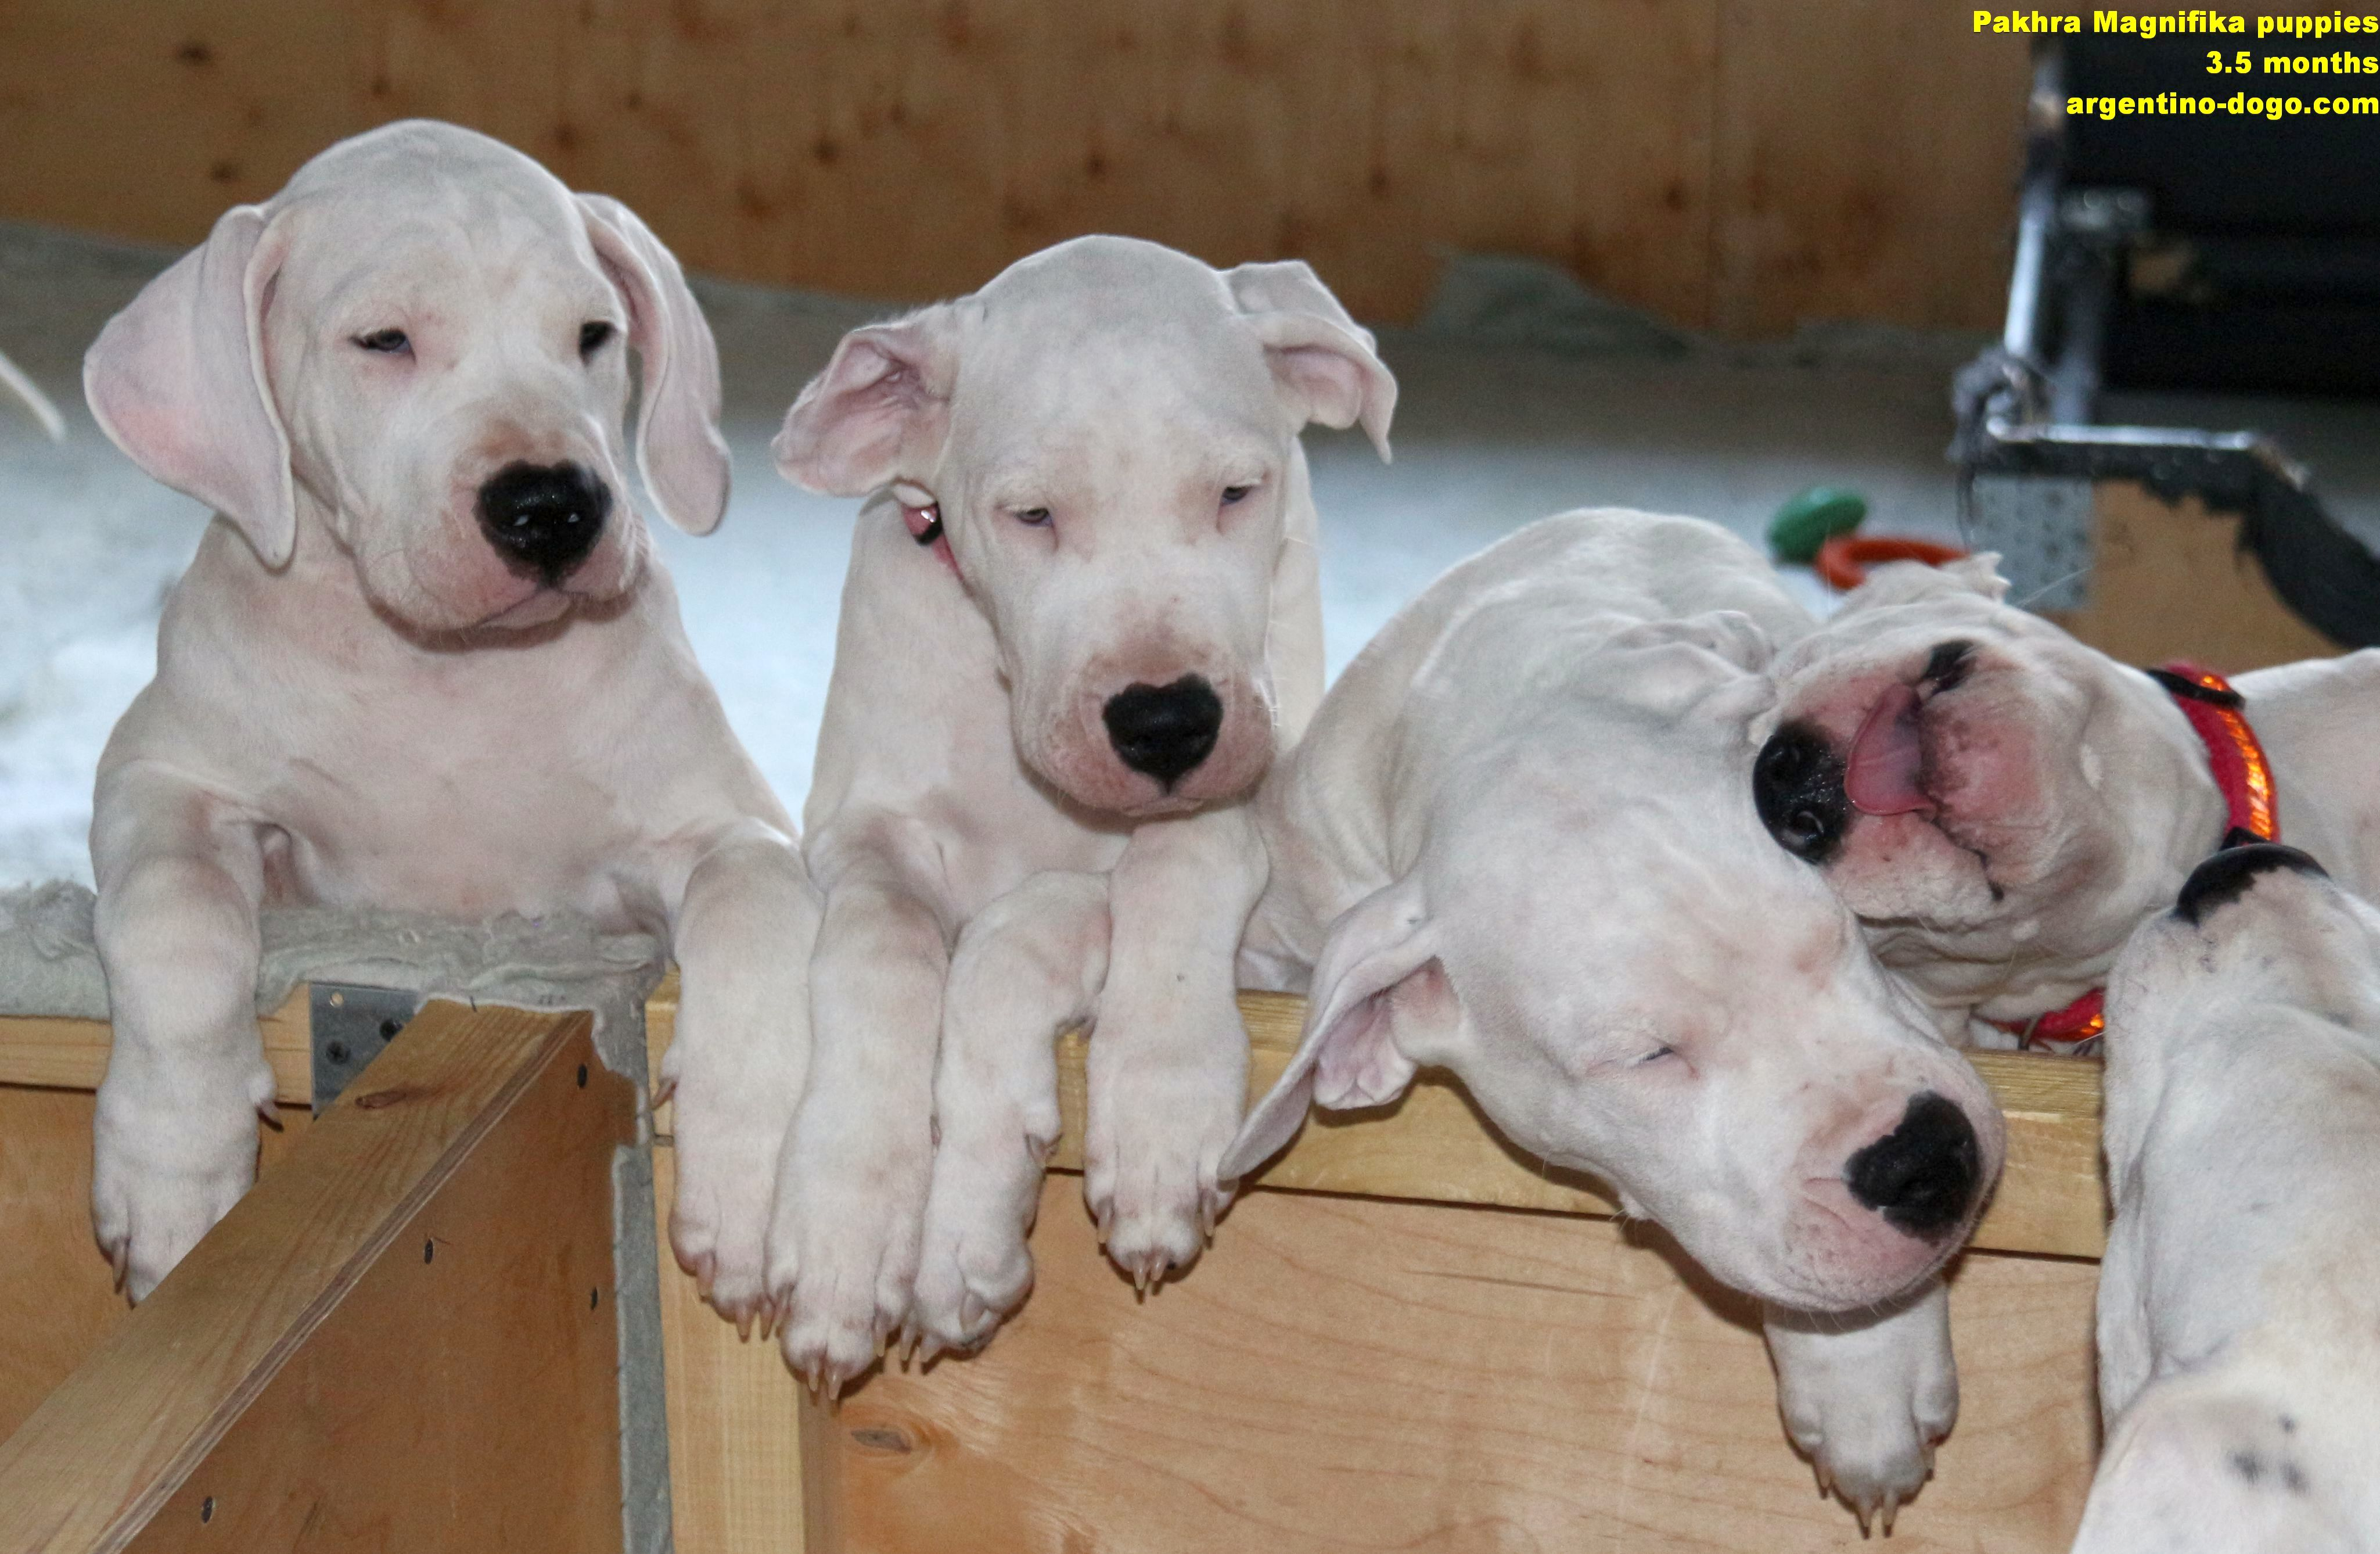 Pakhra Magnifika puppies